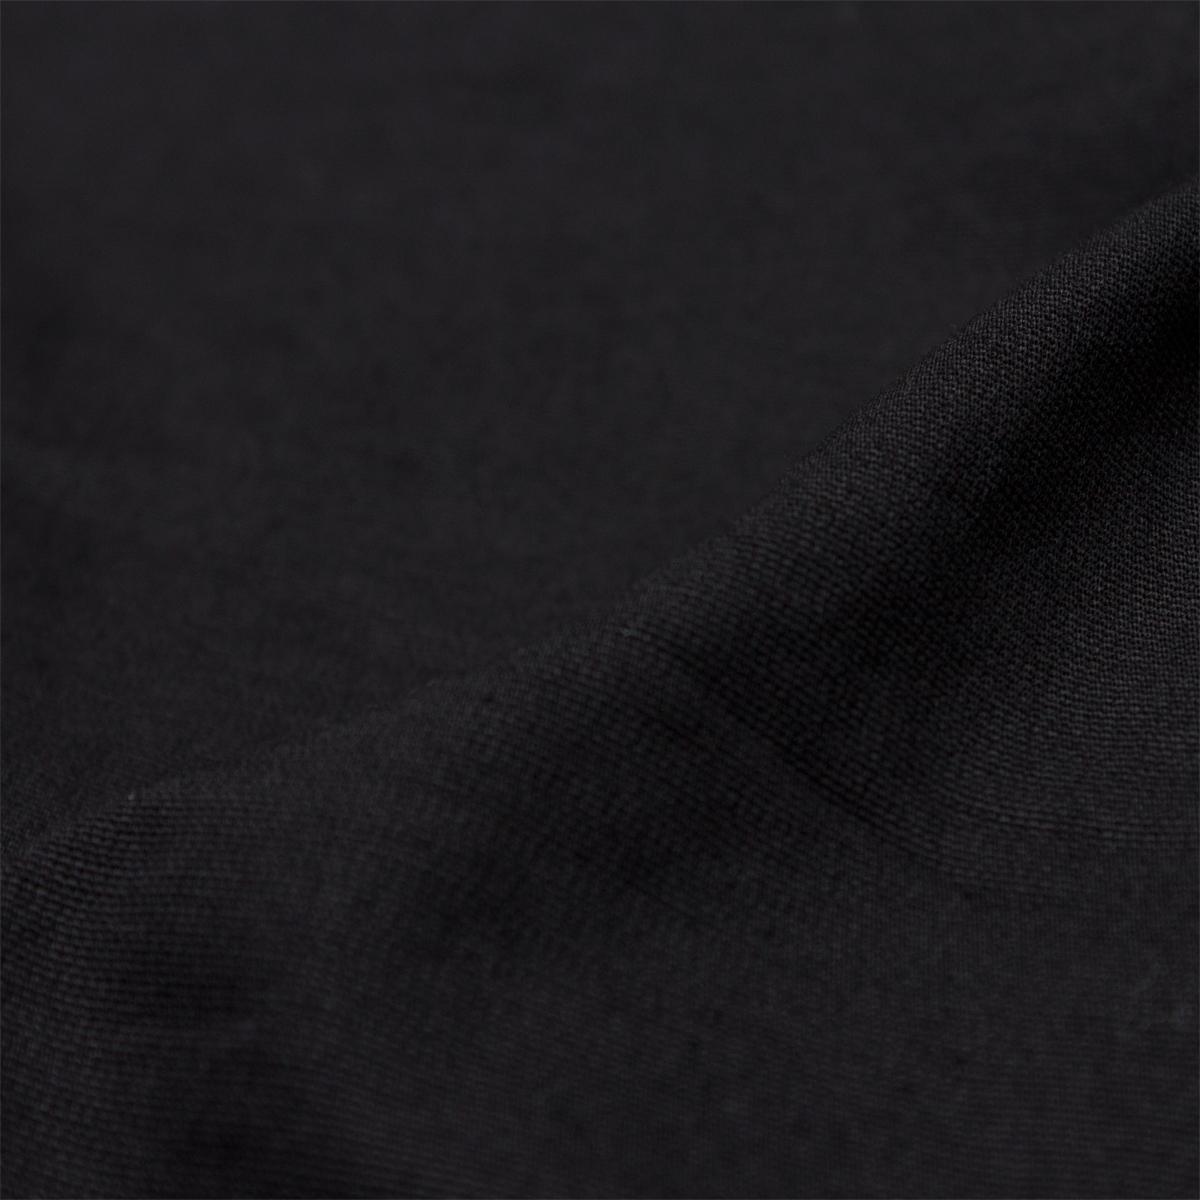 【BURNER×THE STRAIT】ブロークンツイルリフレクタープリントパンツ #BLACK